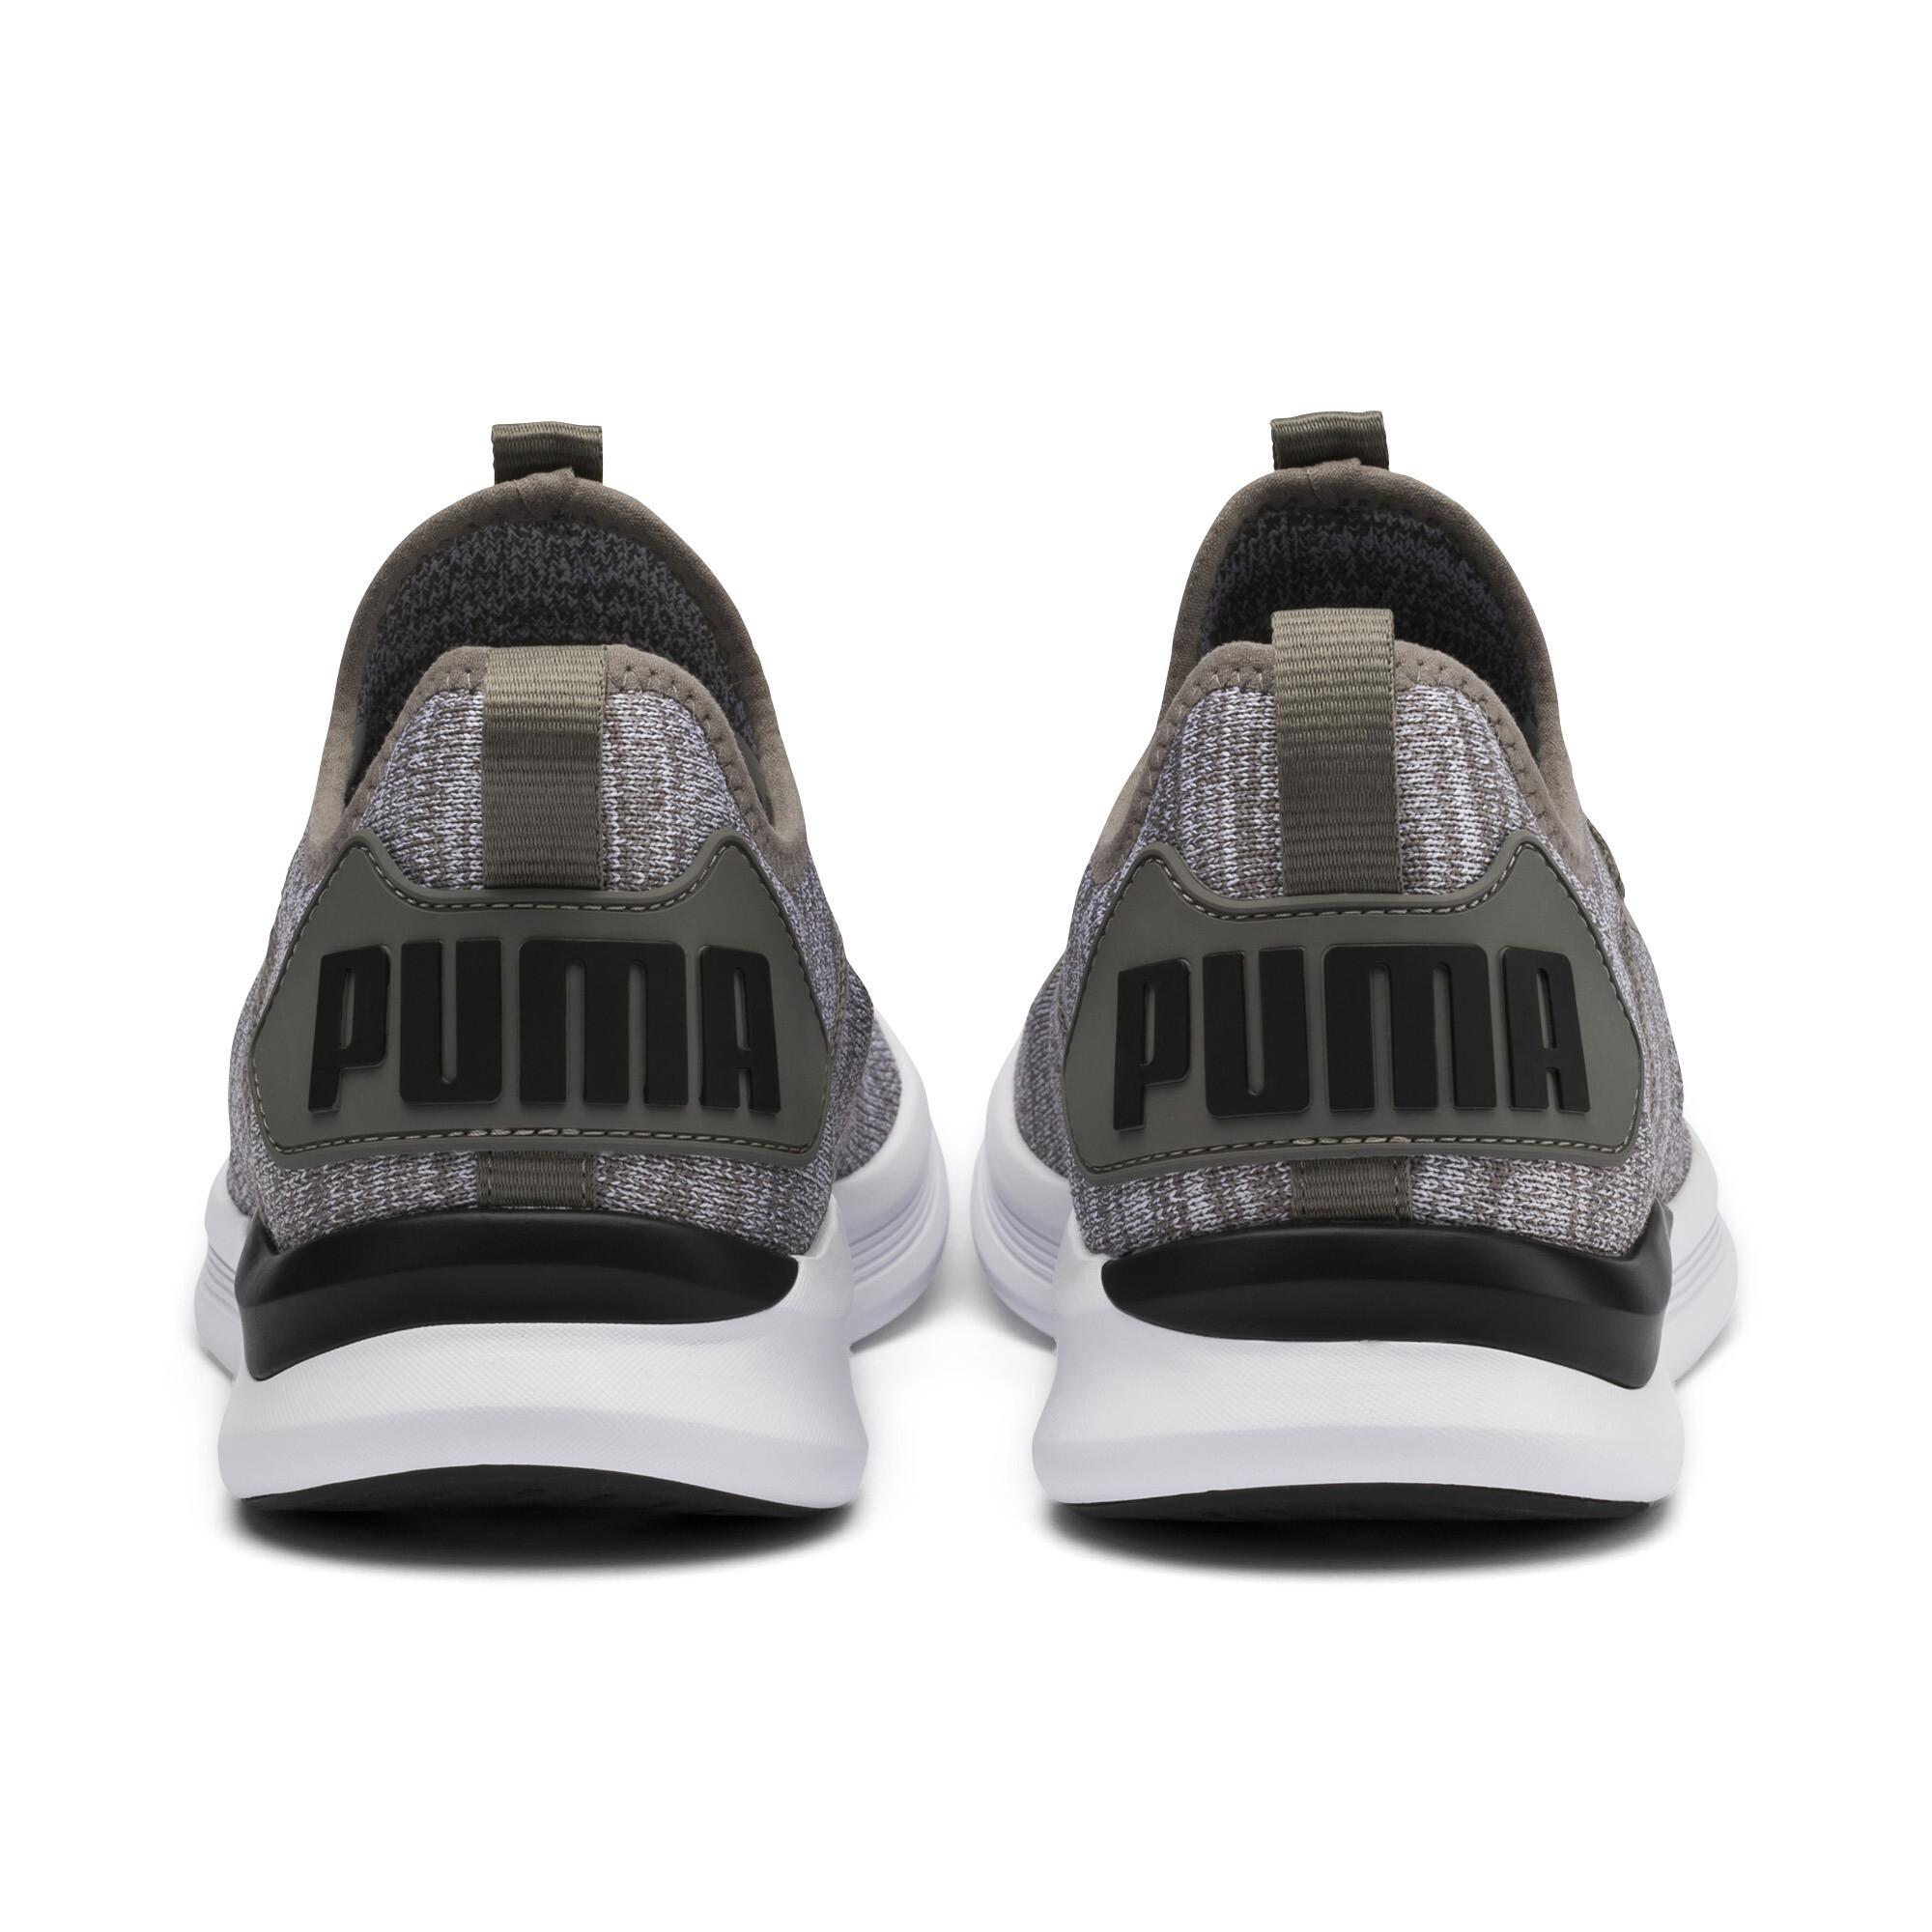 Image Puma IGNITE Flash evoKNIT Men's Training Shoes #4